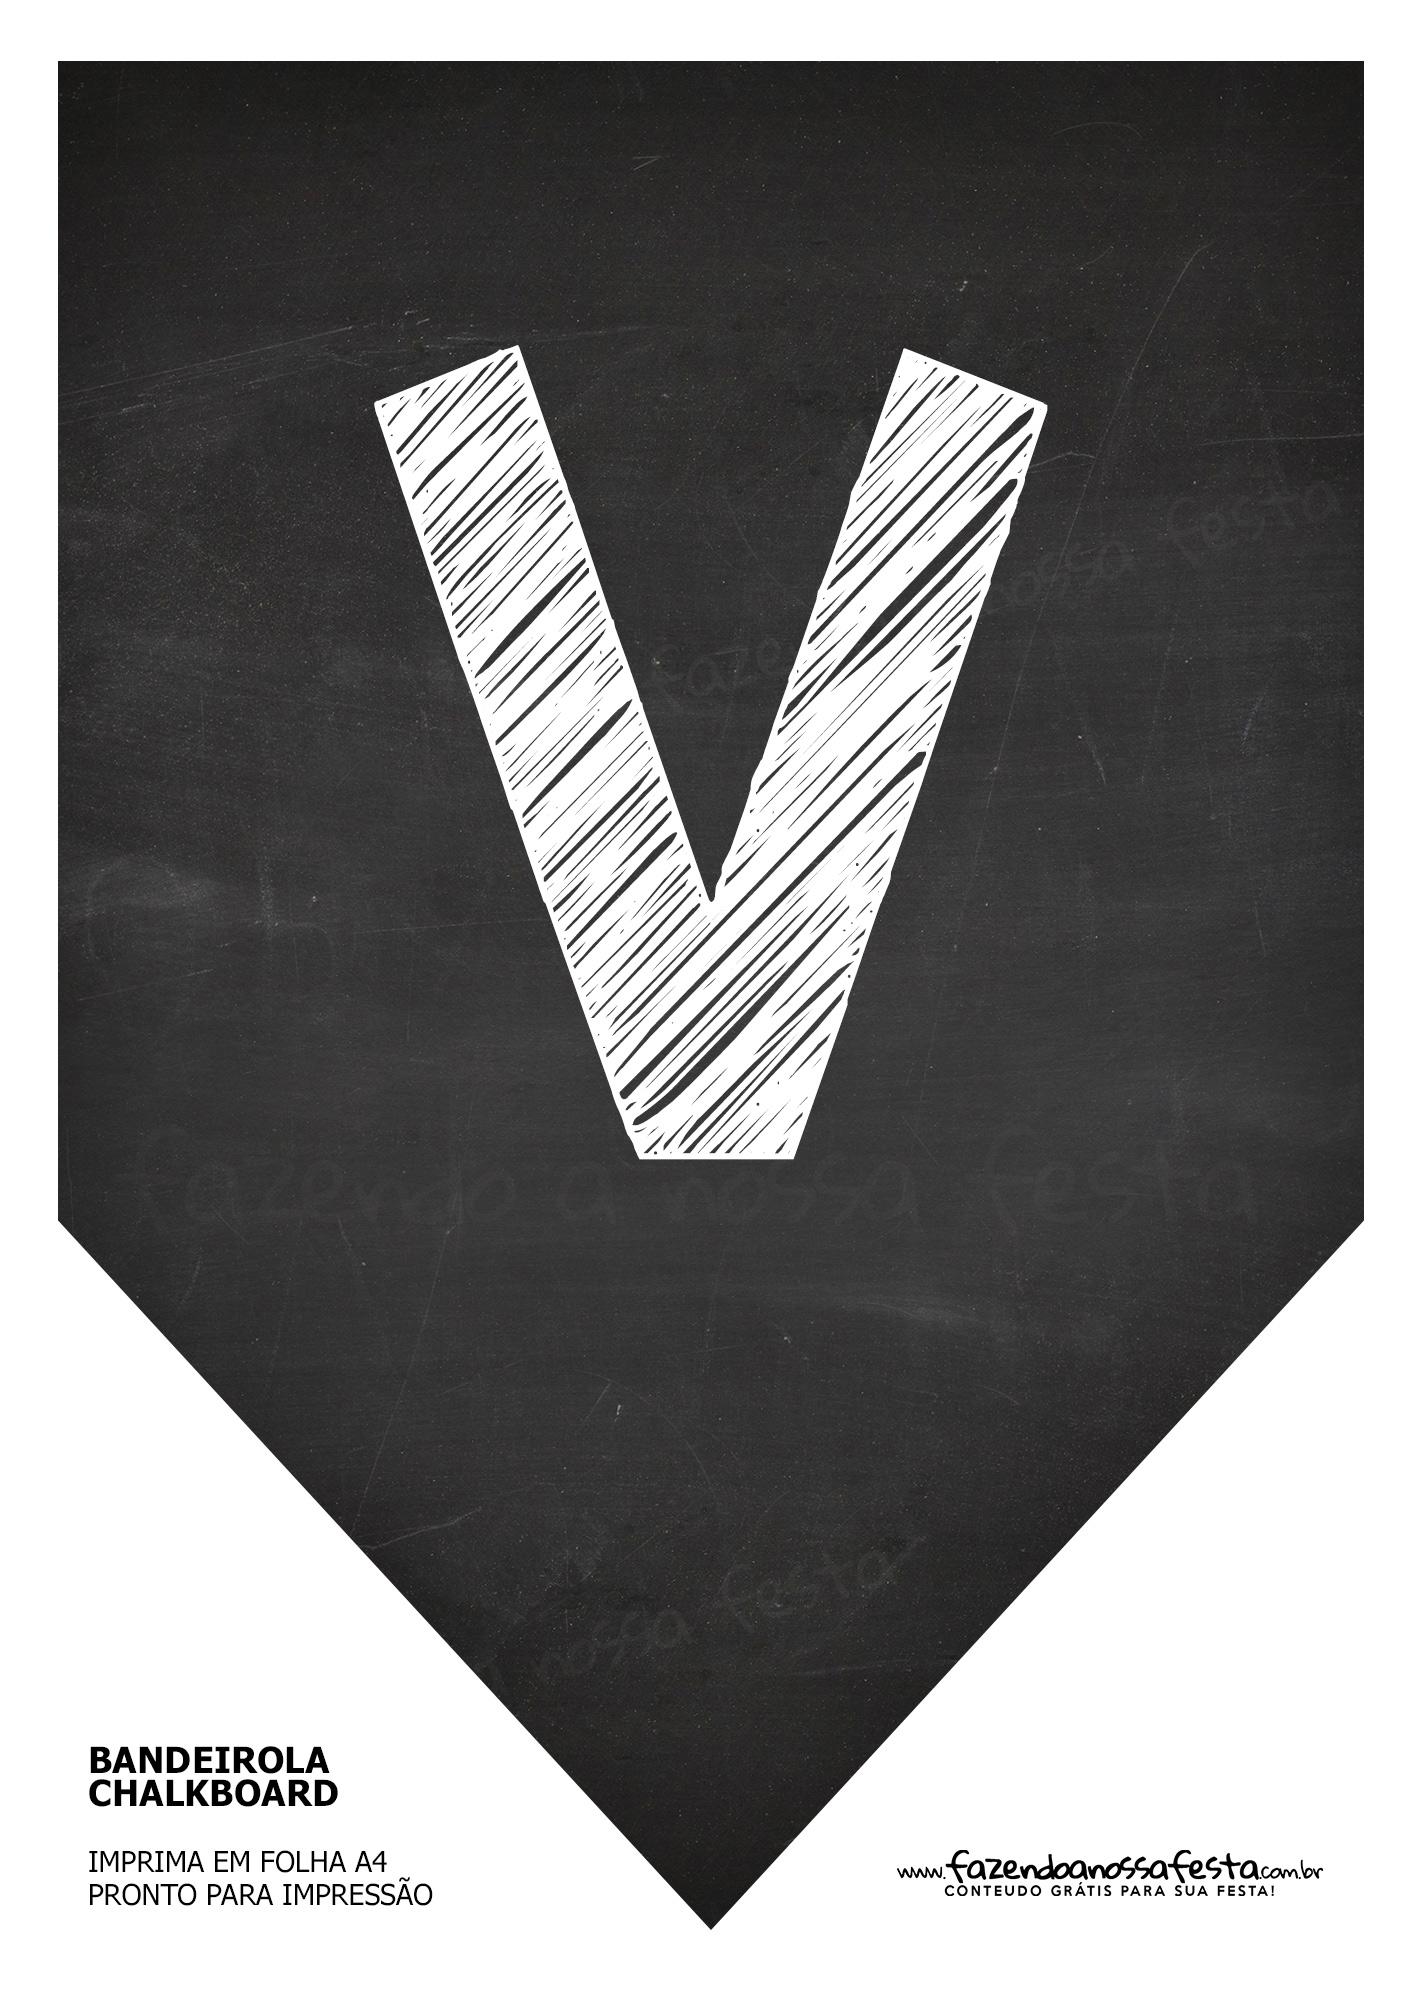 Bandeirinha Chalkboard V